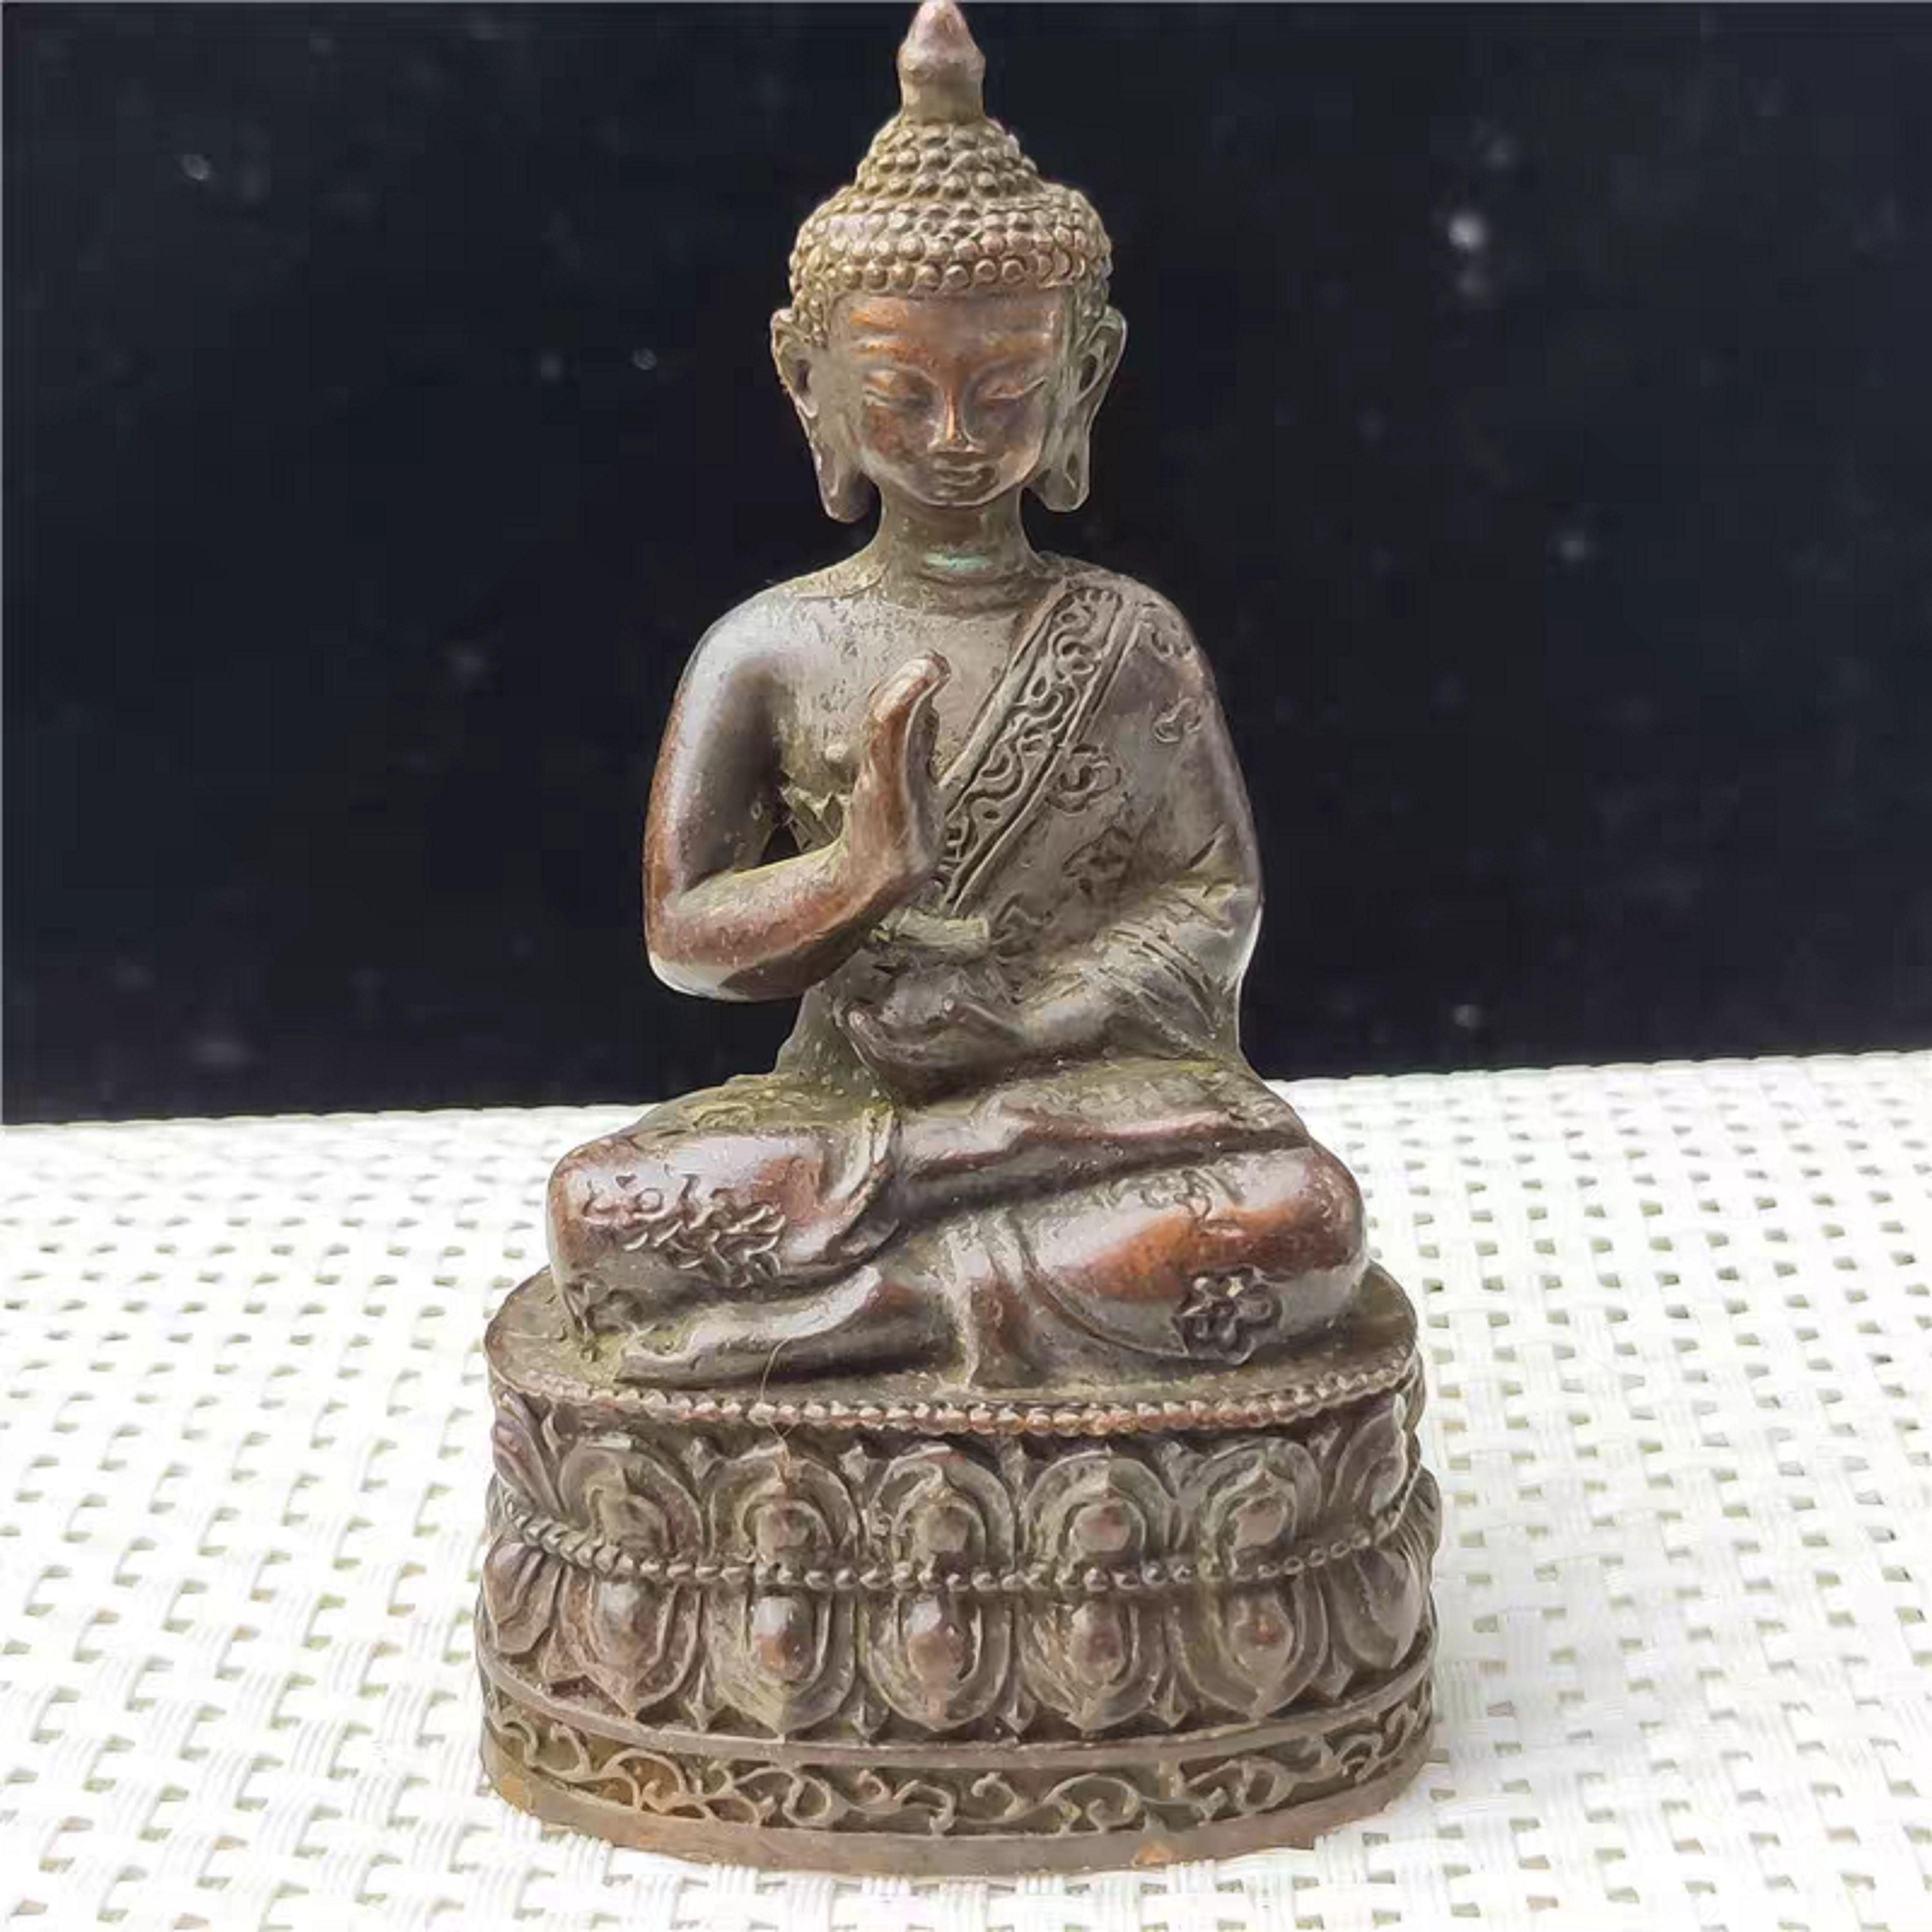 Antique Pure brass statue copper carving ORNAMENT Religious Buddha Yoga Sakyamuni, Buddha, monk, meditation, meditation, meditat